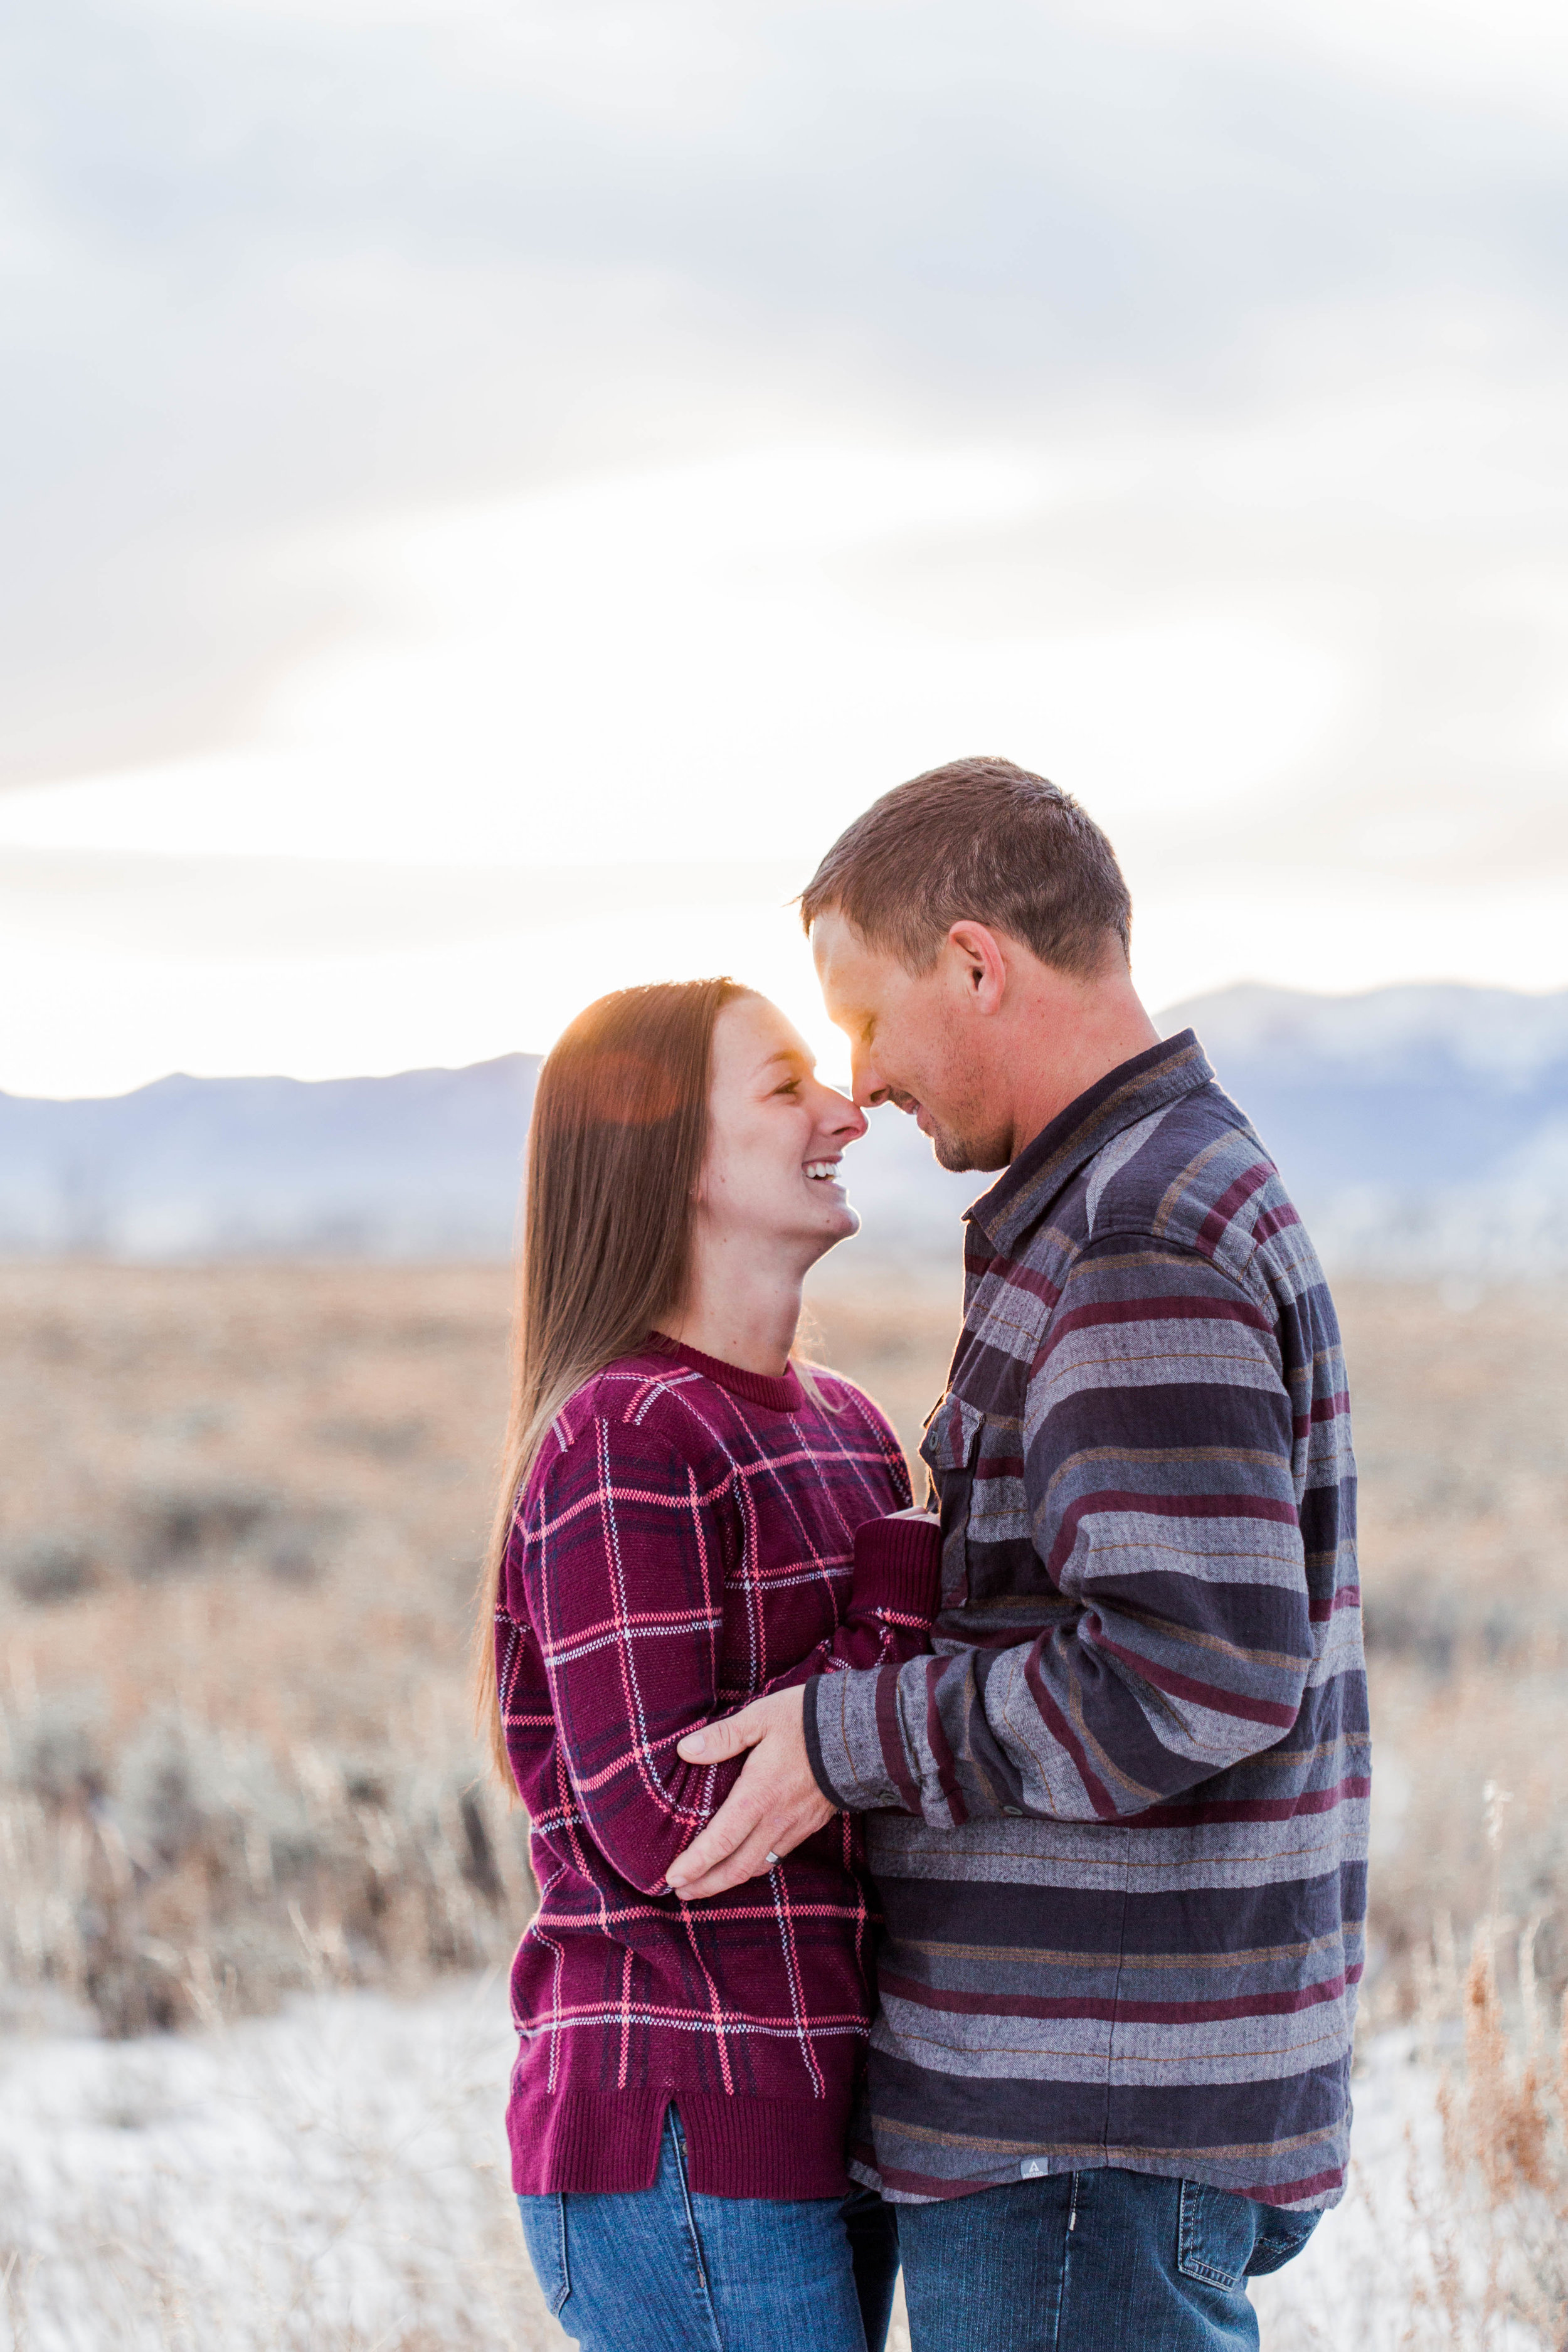 nicole-daacke-photography-grand-teton-elopement-grand-teton-wedding-national-park-wedding-adventure-wedding-adventurous-engagement-session-snowy-winter-inspiration-photographer-30.jpg